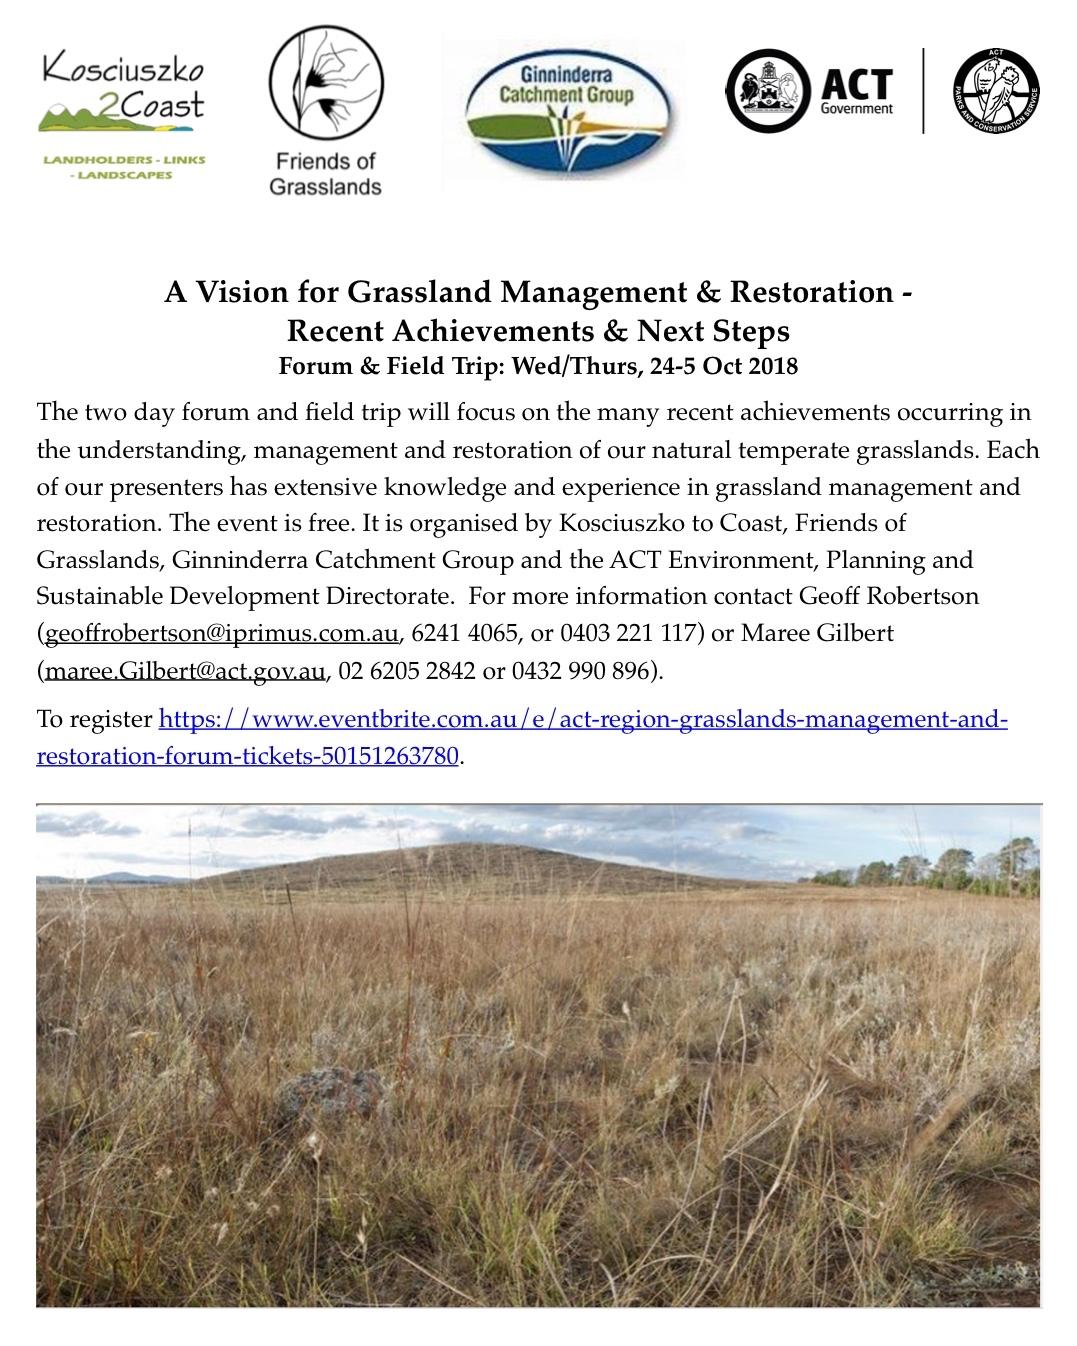 K2C-FOG-ACT Govt Grassland Forum & Field Trip